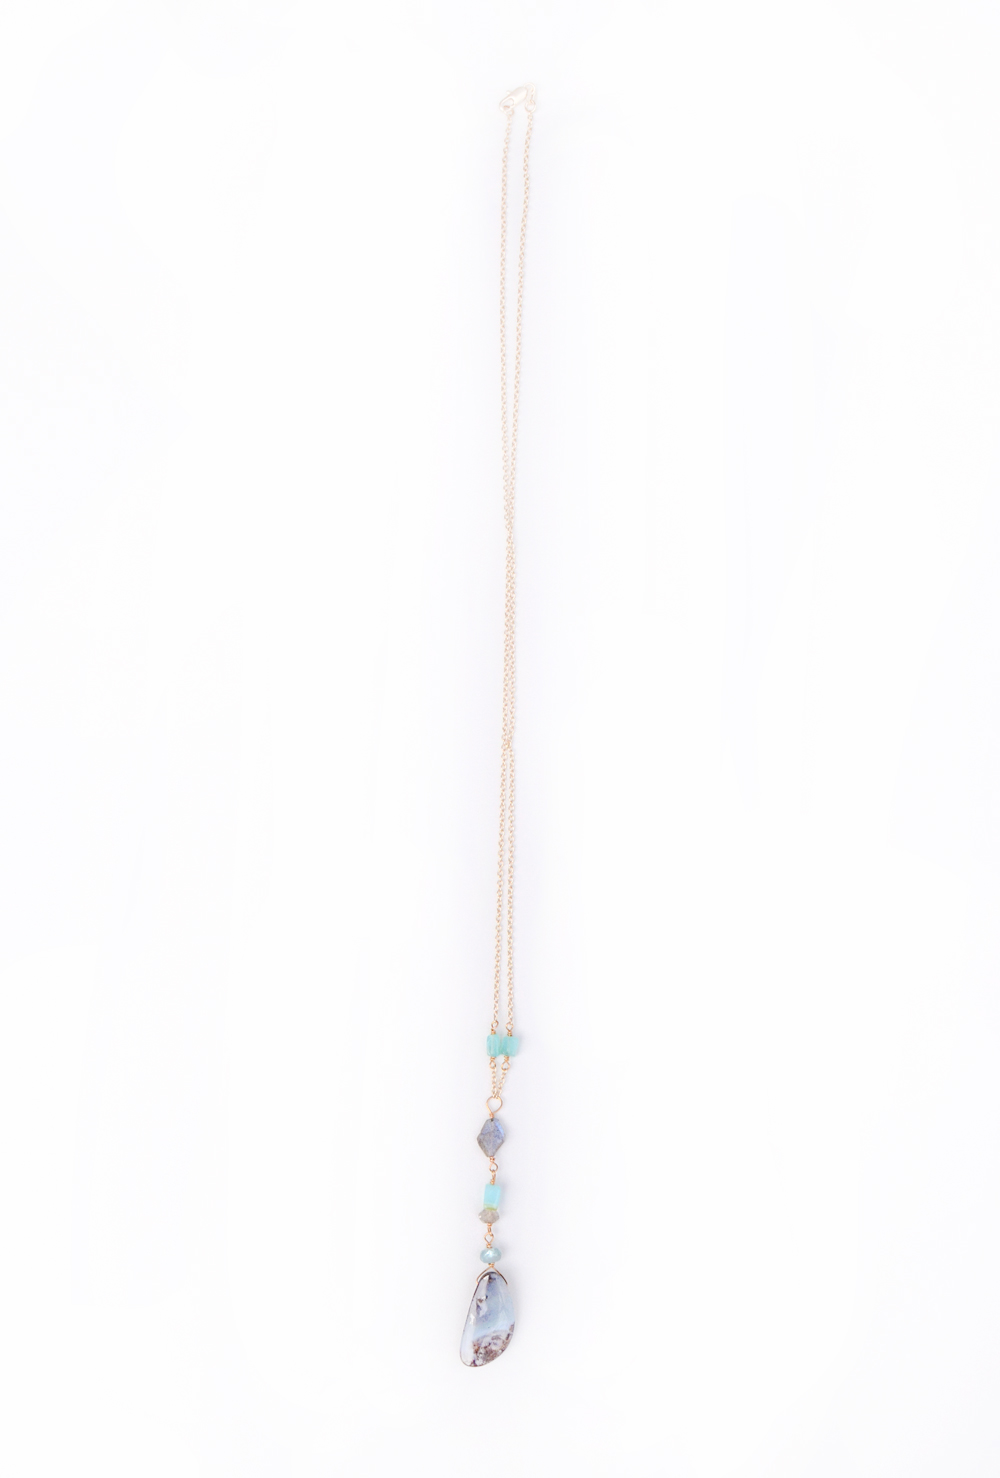 Boulder-Opal-Pendant-Necklace-1.jpg